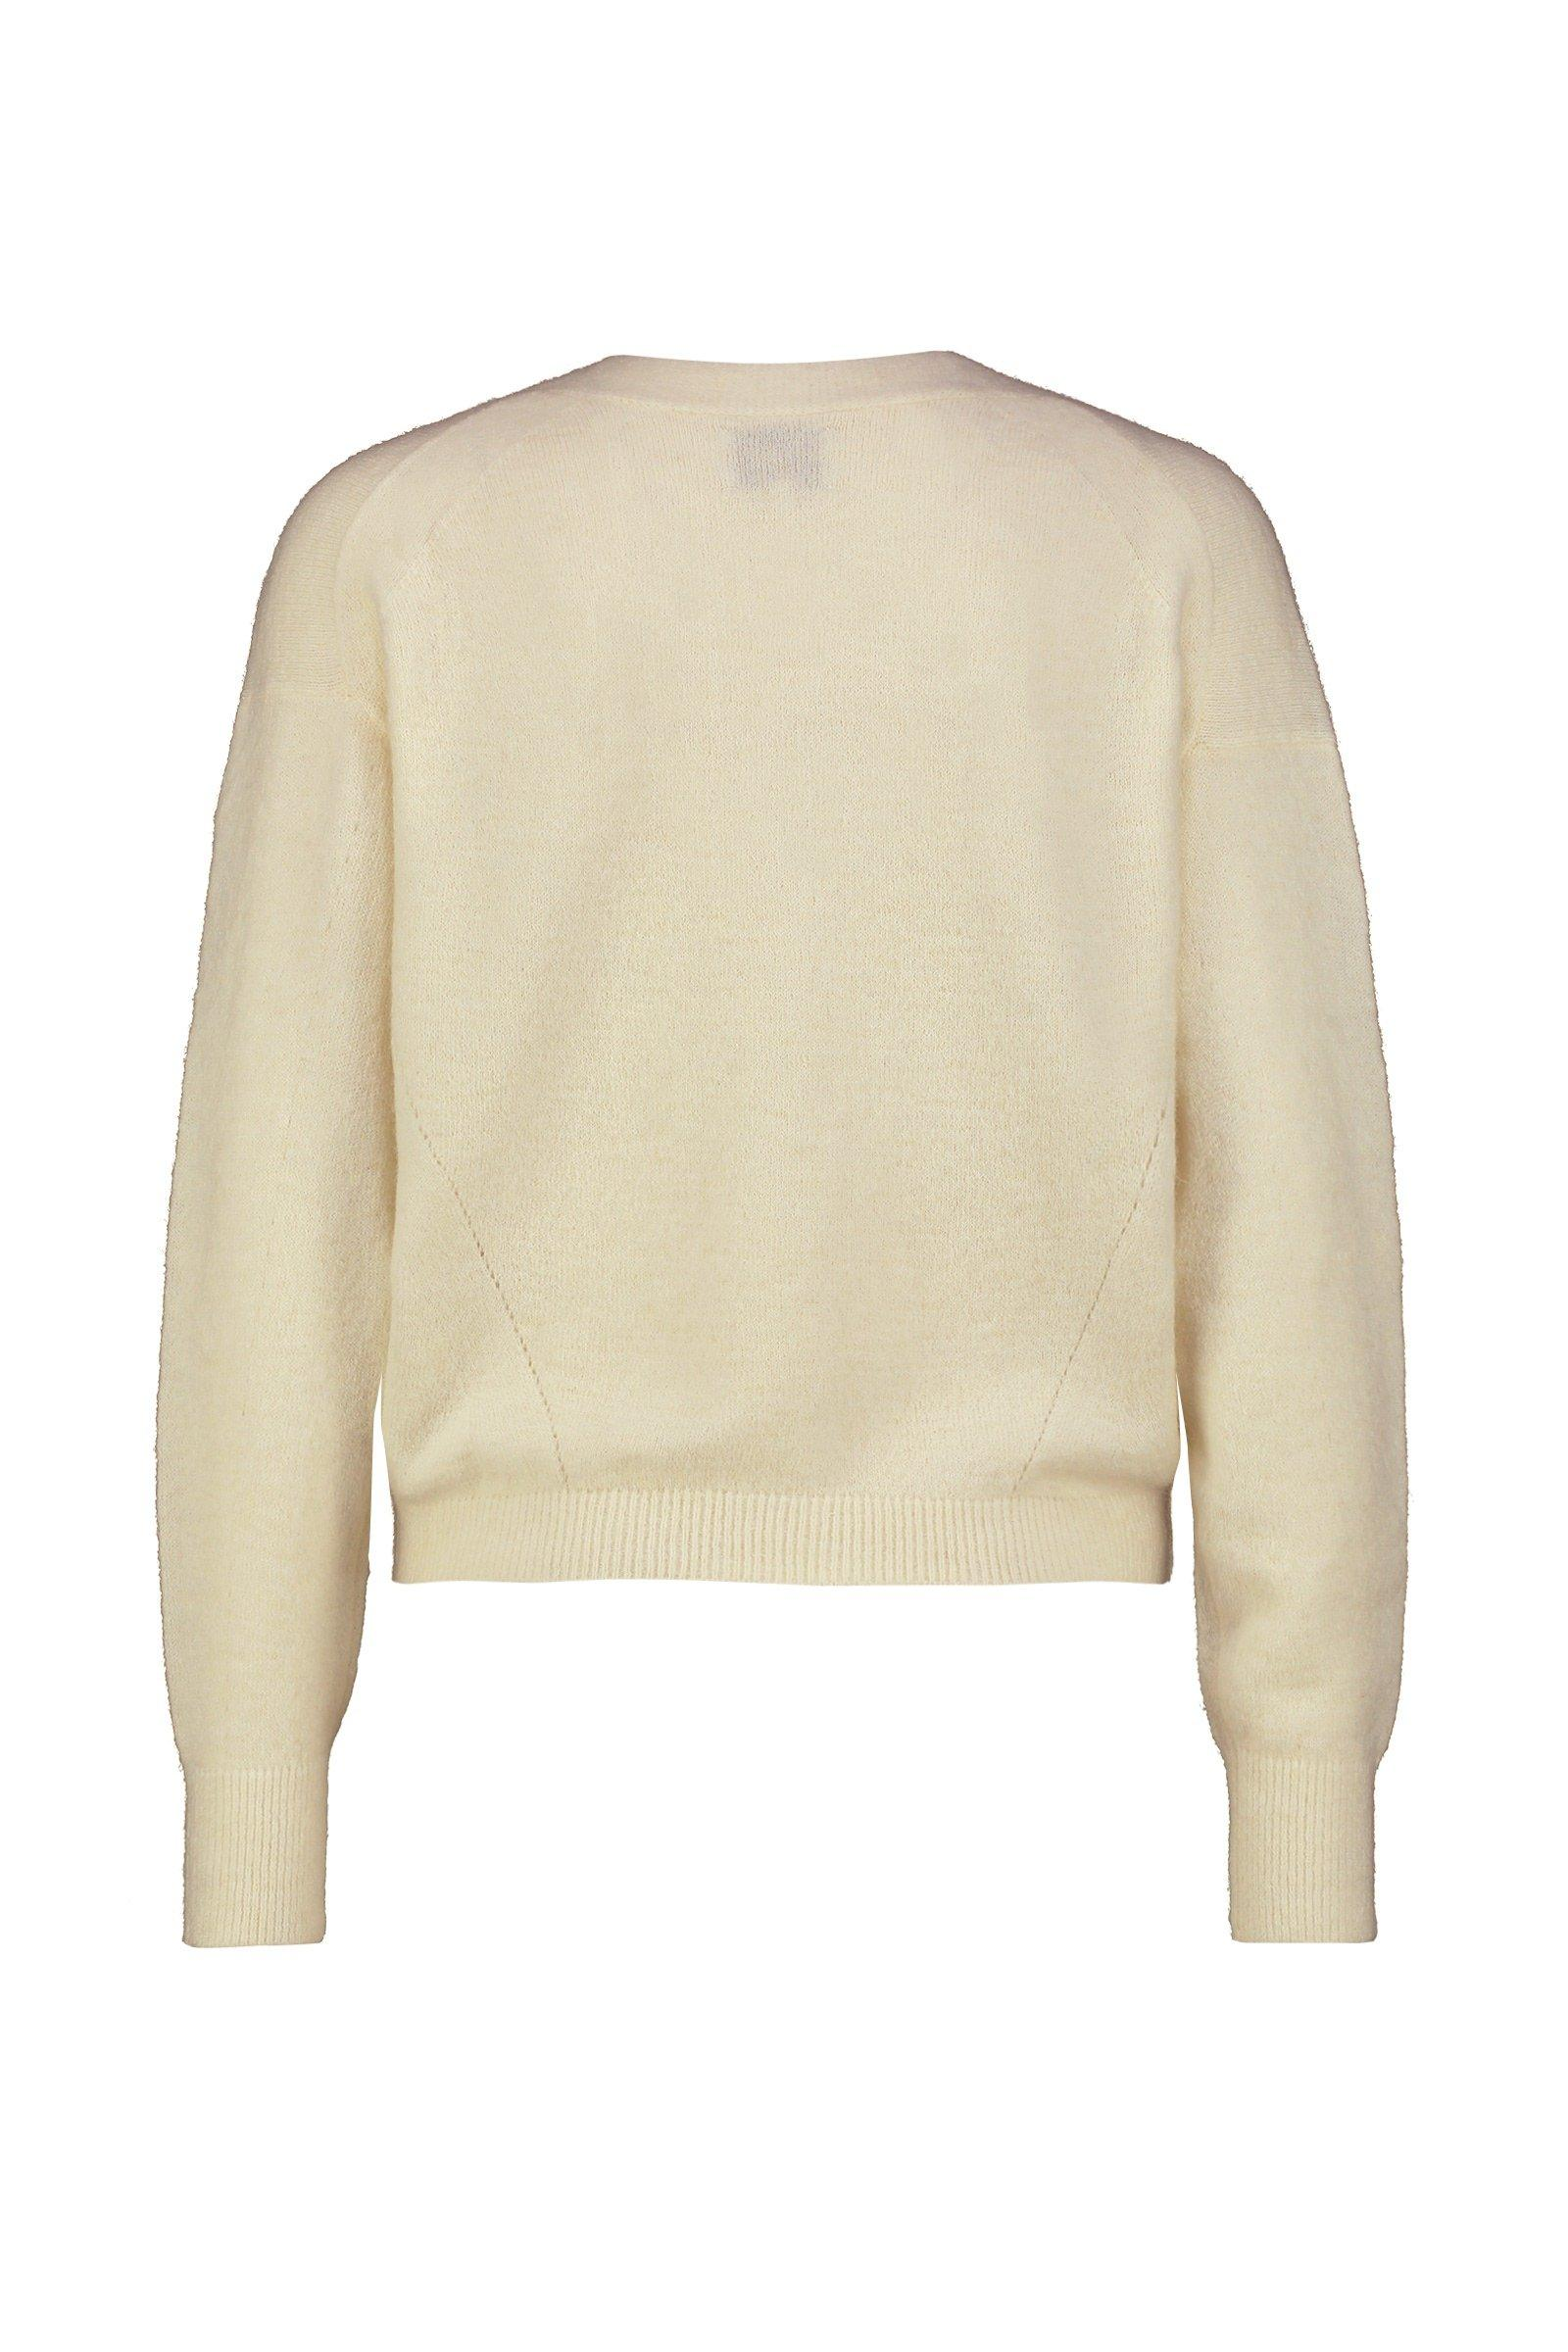 https://webmedia.cks-fashion.com/i/cks/118889WTM_100_h